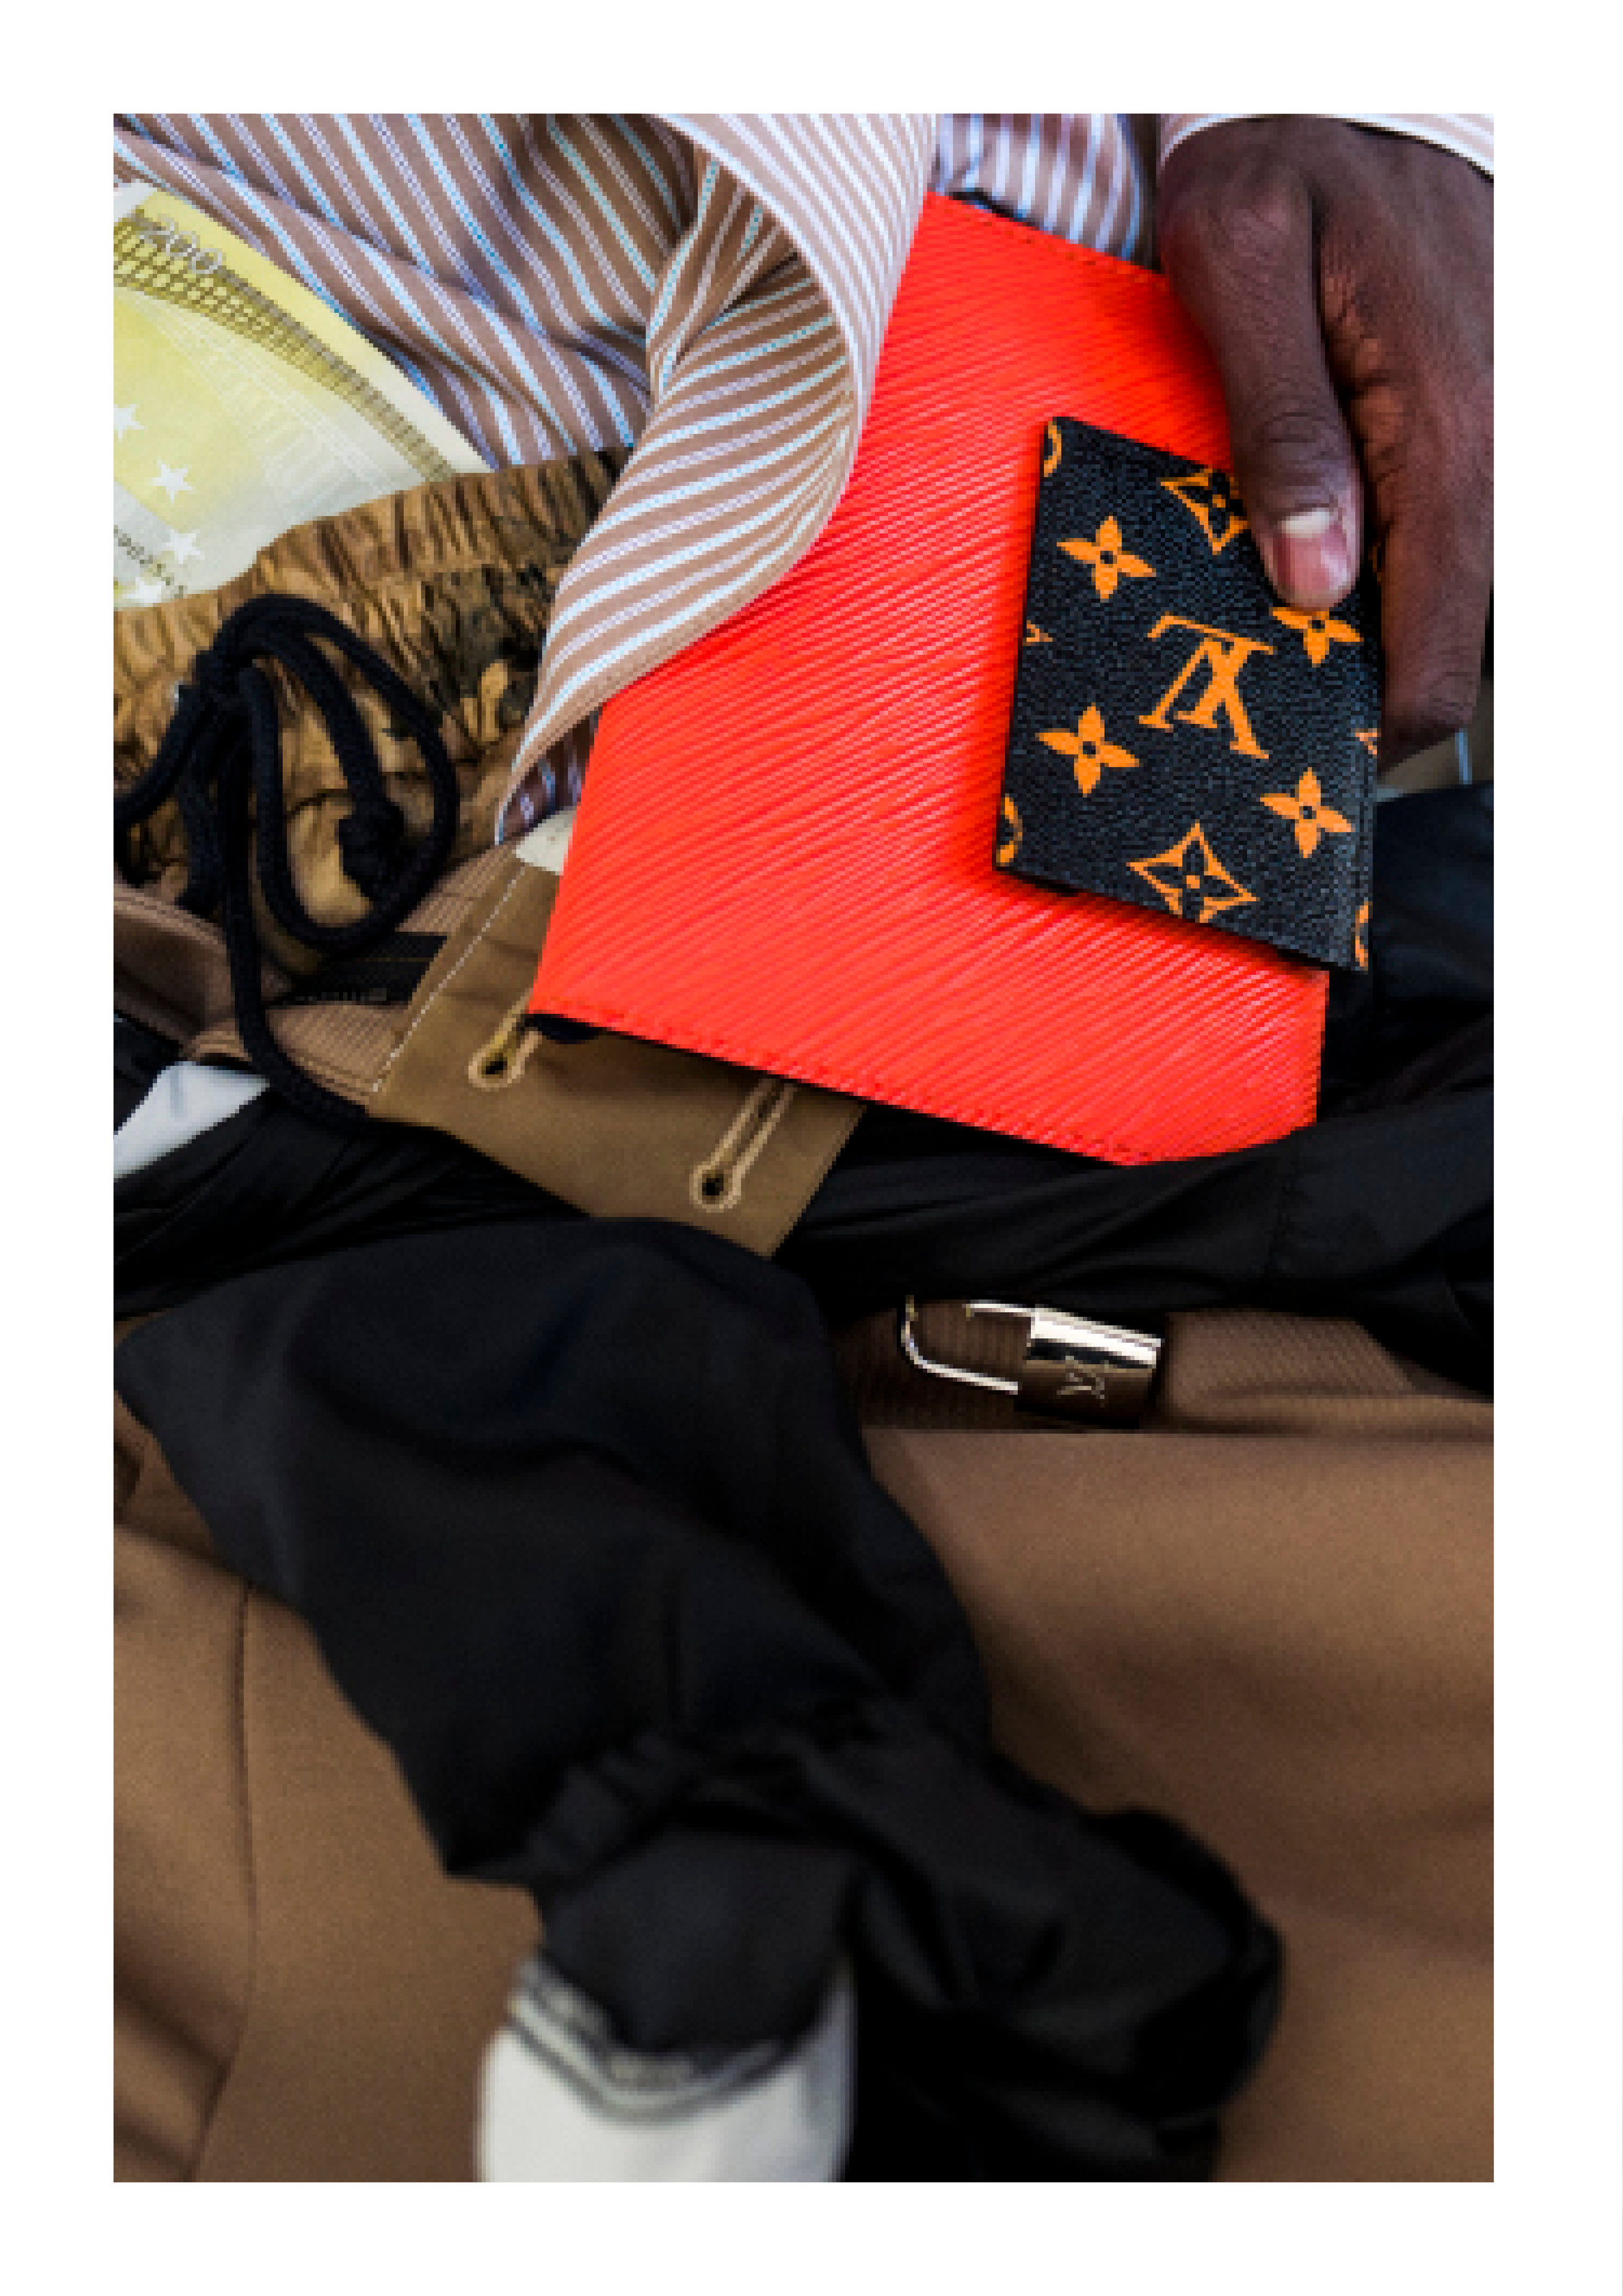 Shirt & Pants - Necessity Sense, Headwear - Prada, Wallet - Louis Vuitton